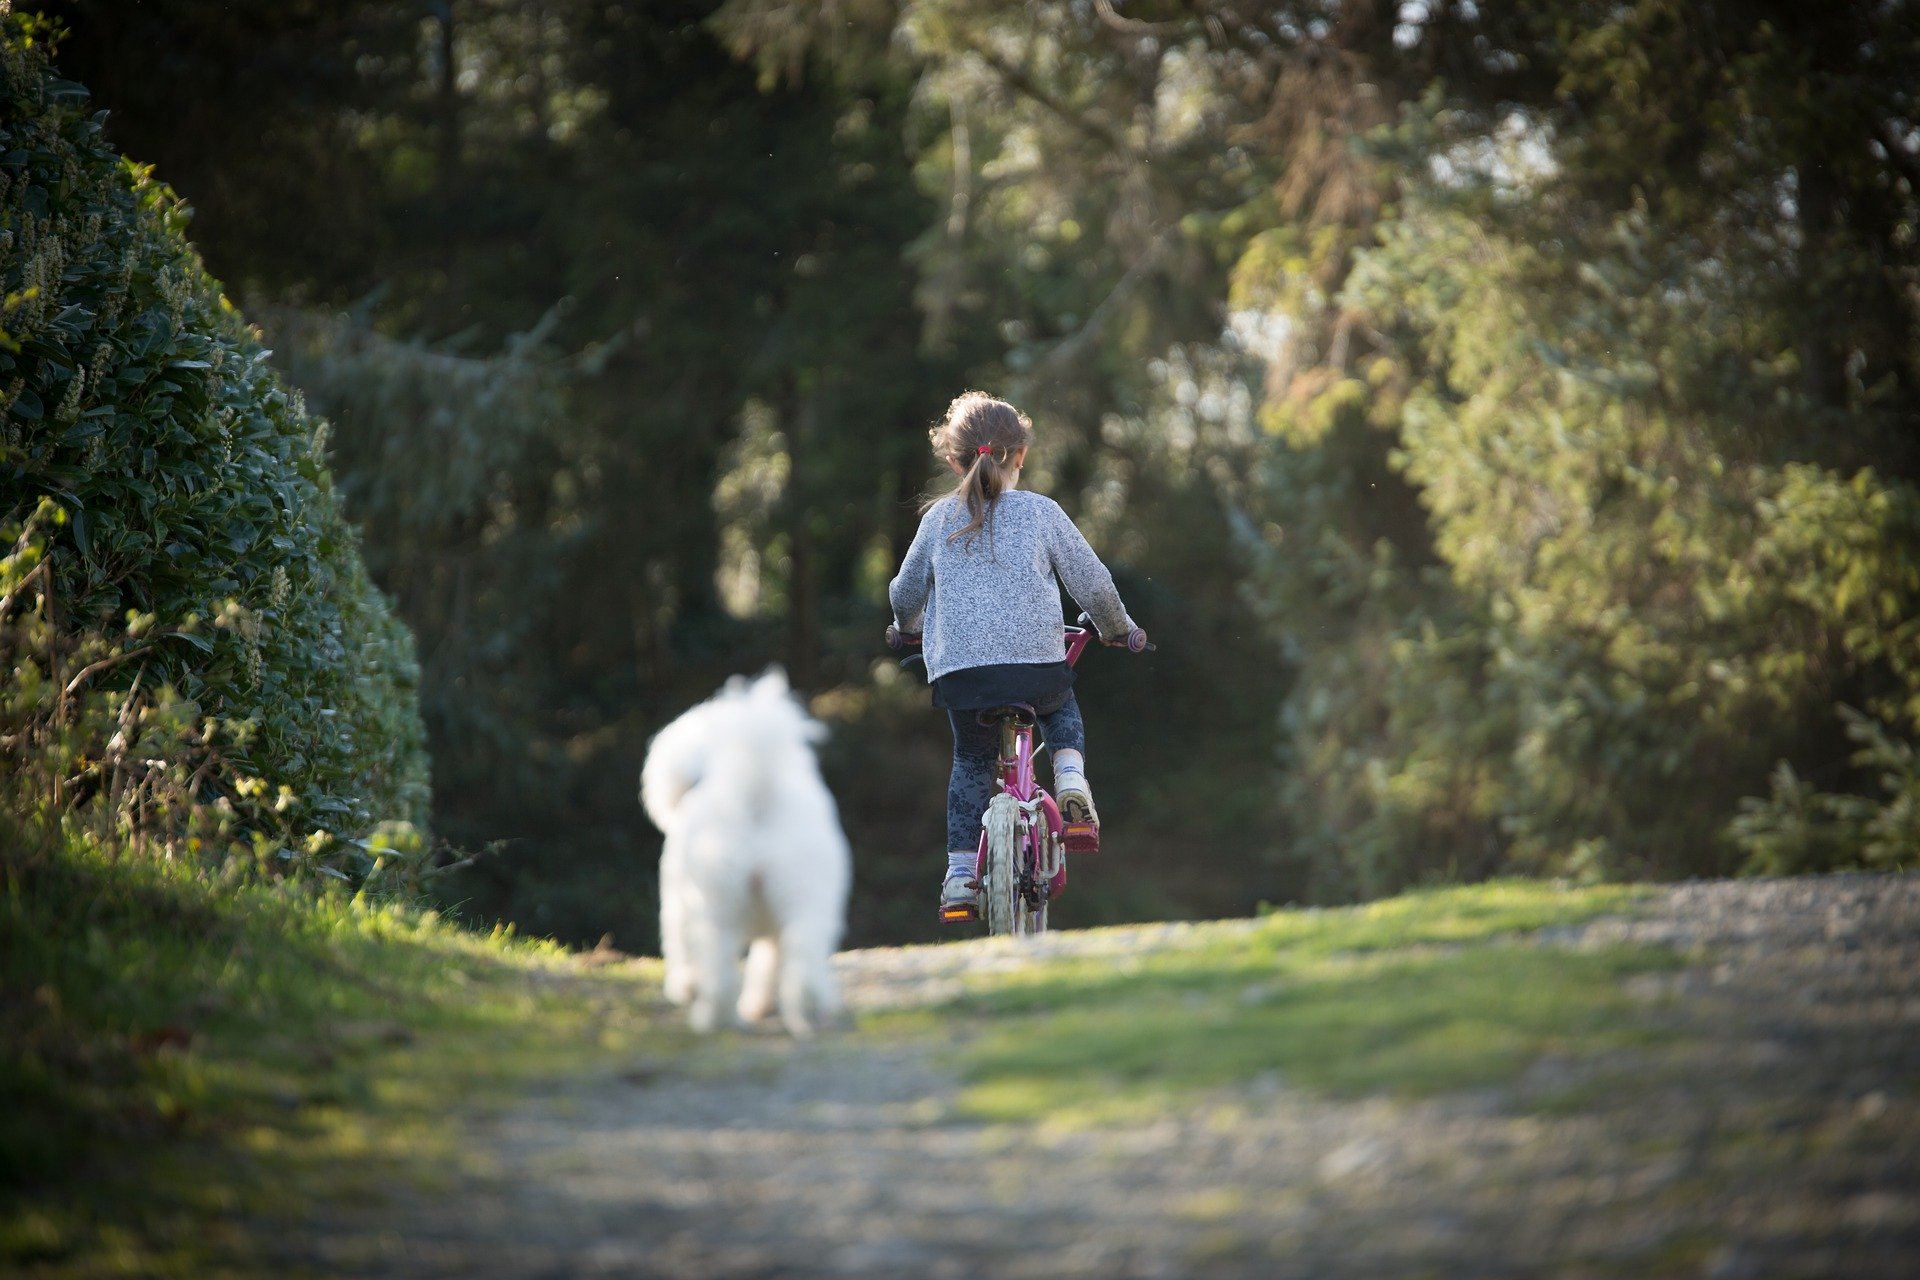 girl on bike ride, with dog